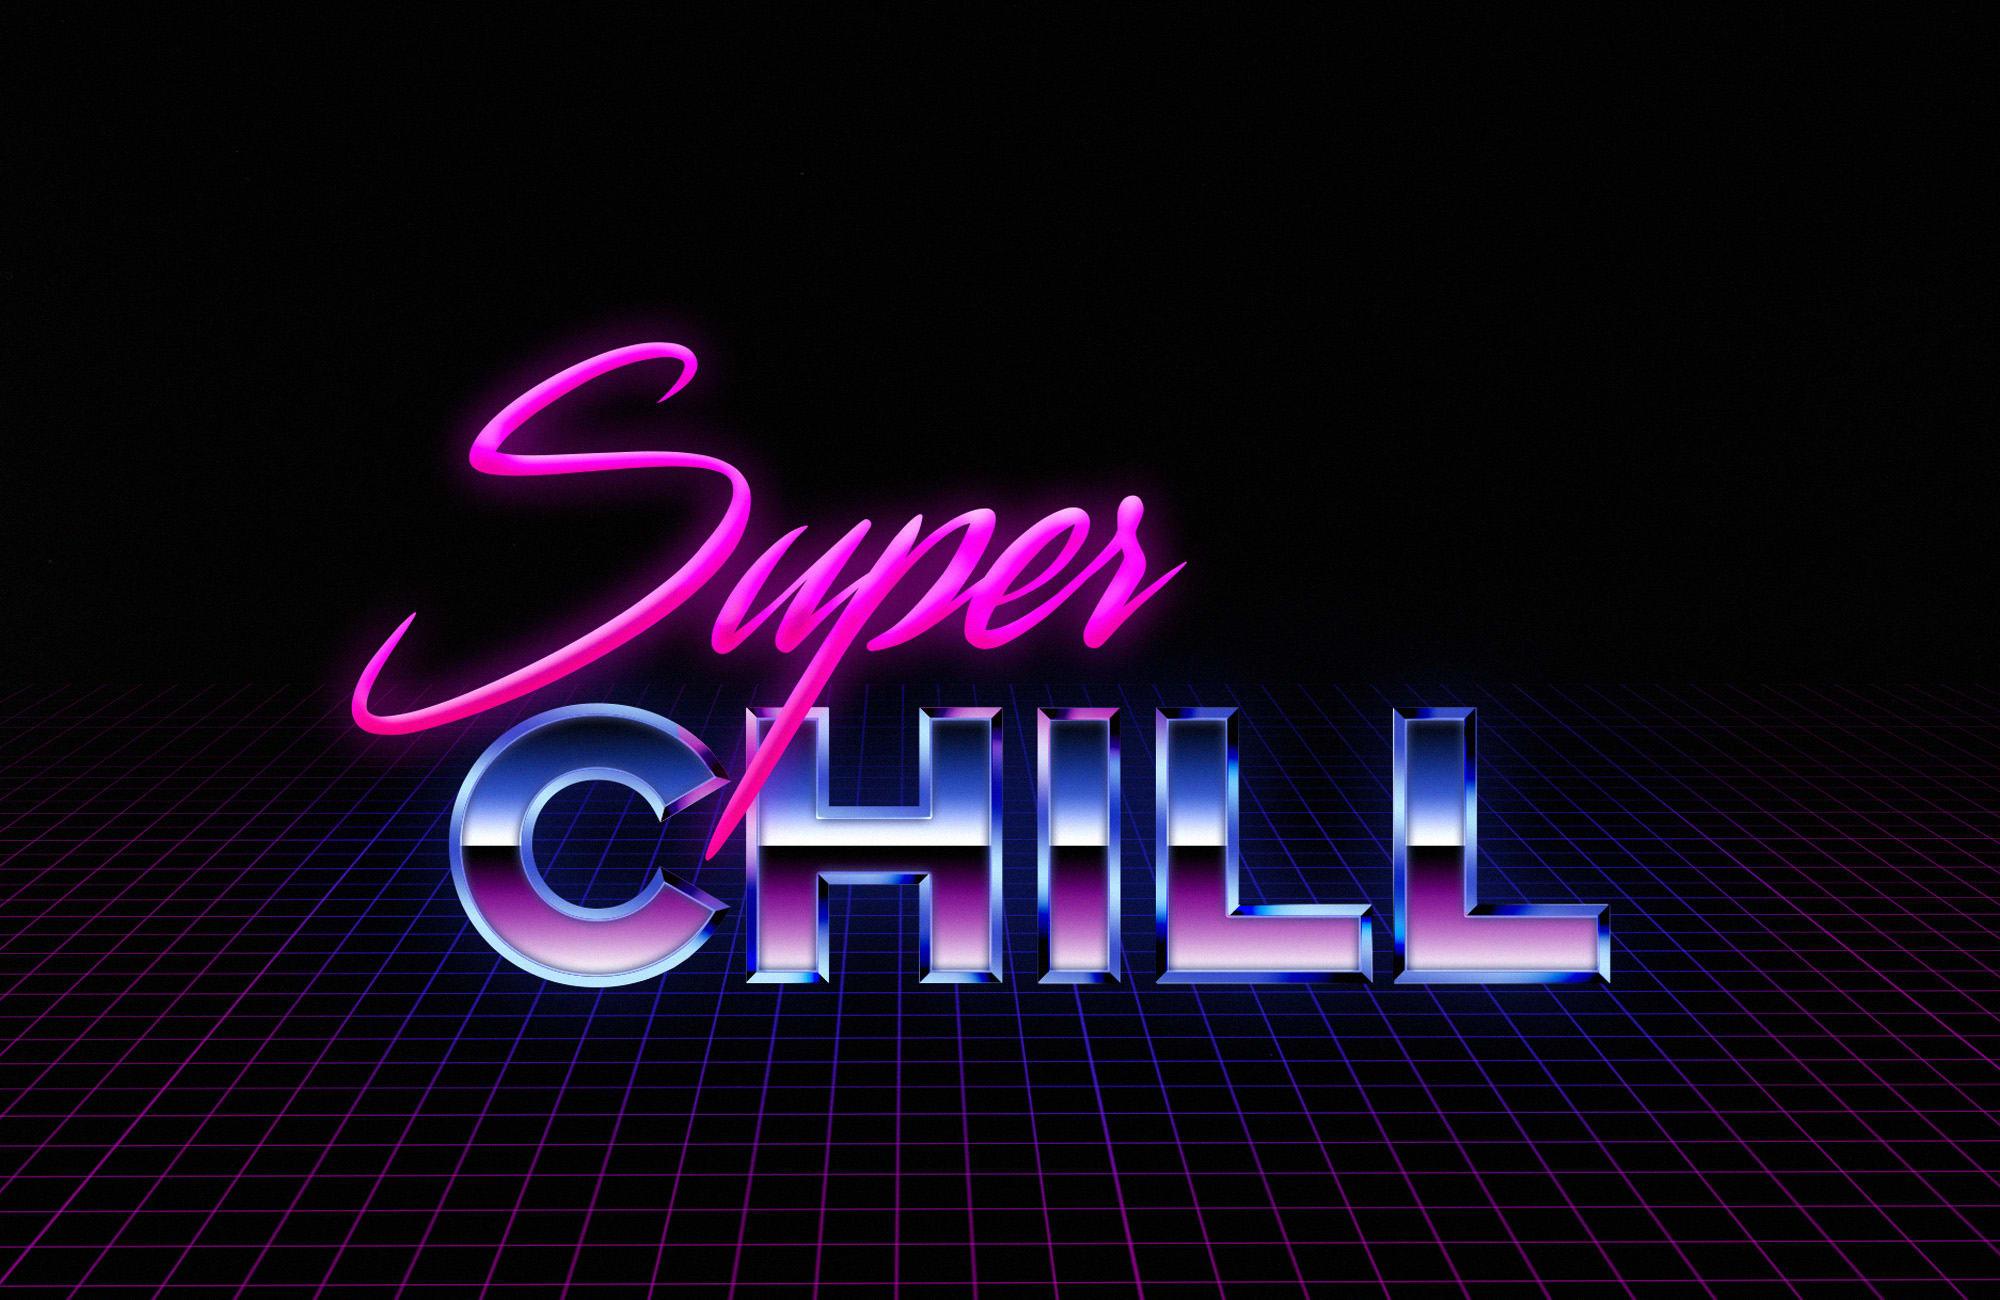 vaporwave cyberpunk logo or background by finwood811 vaporwave cyberpunk logo or background